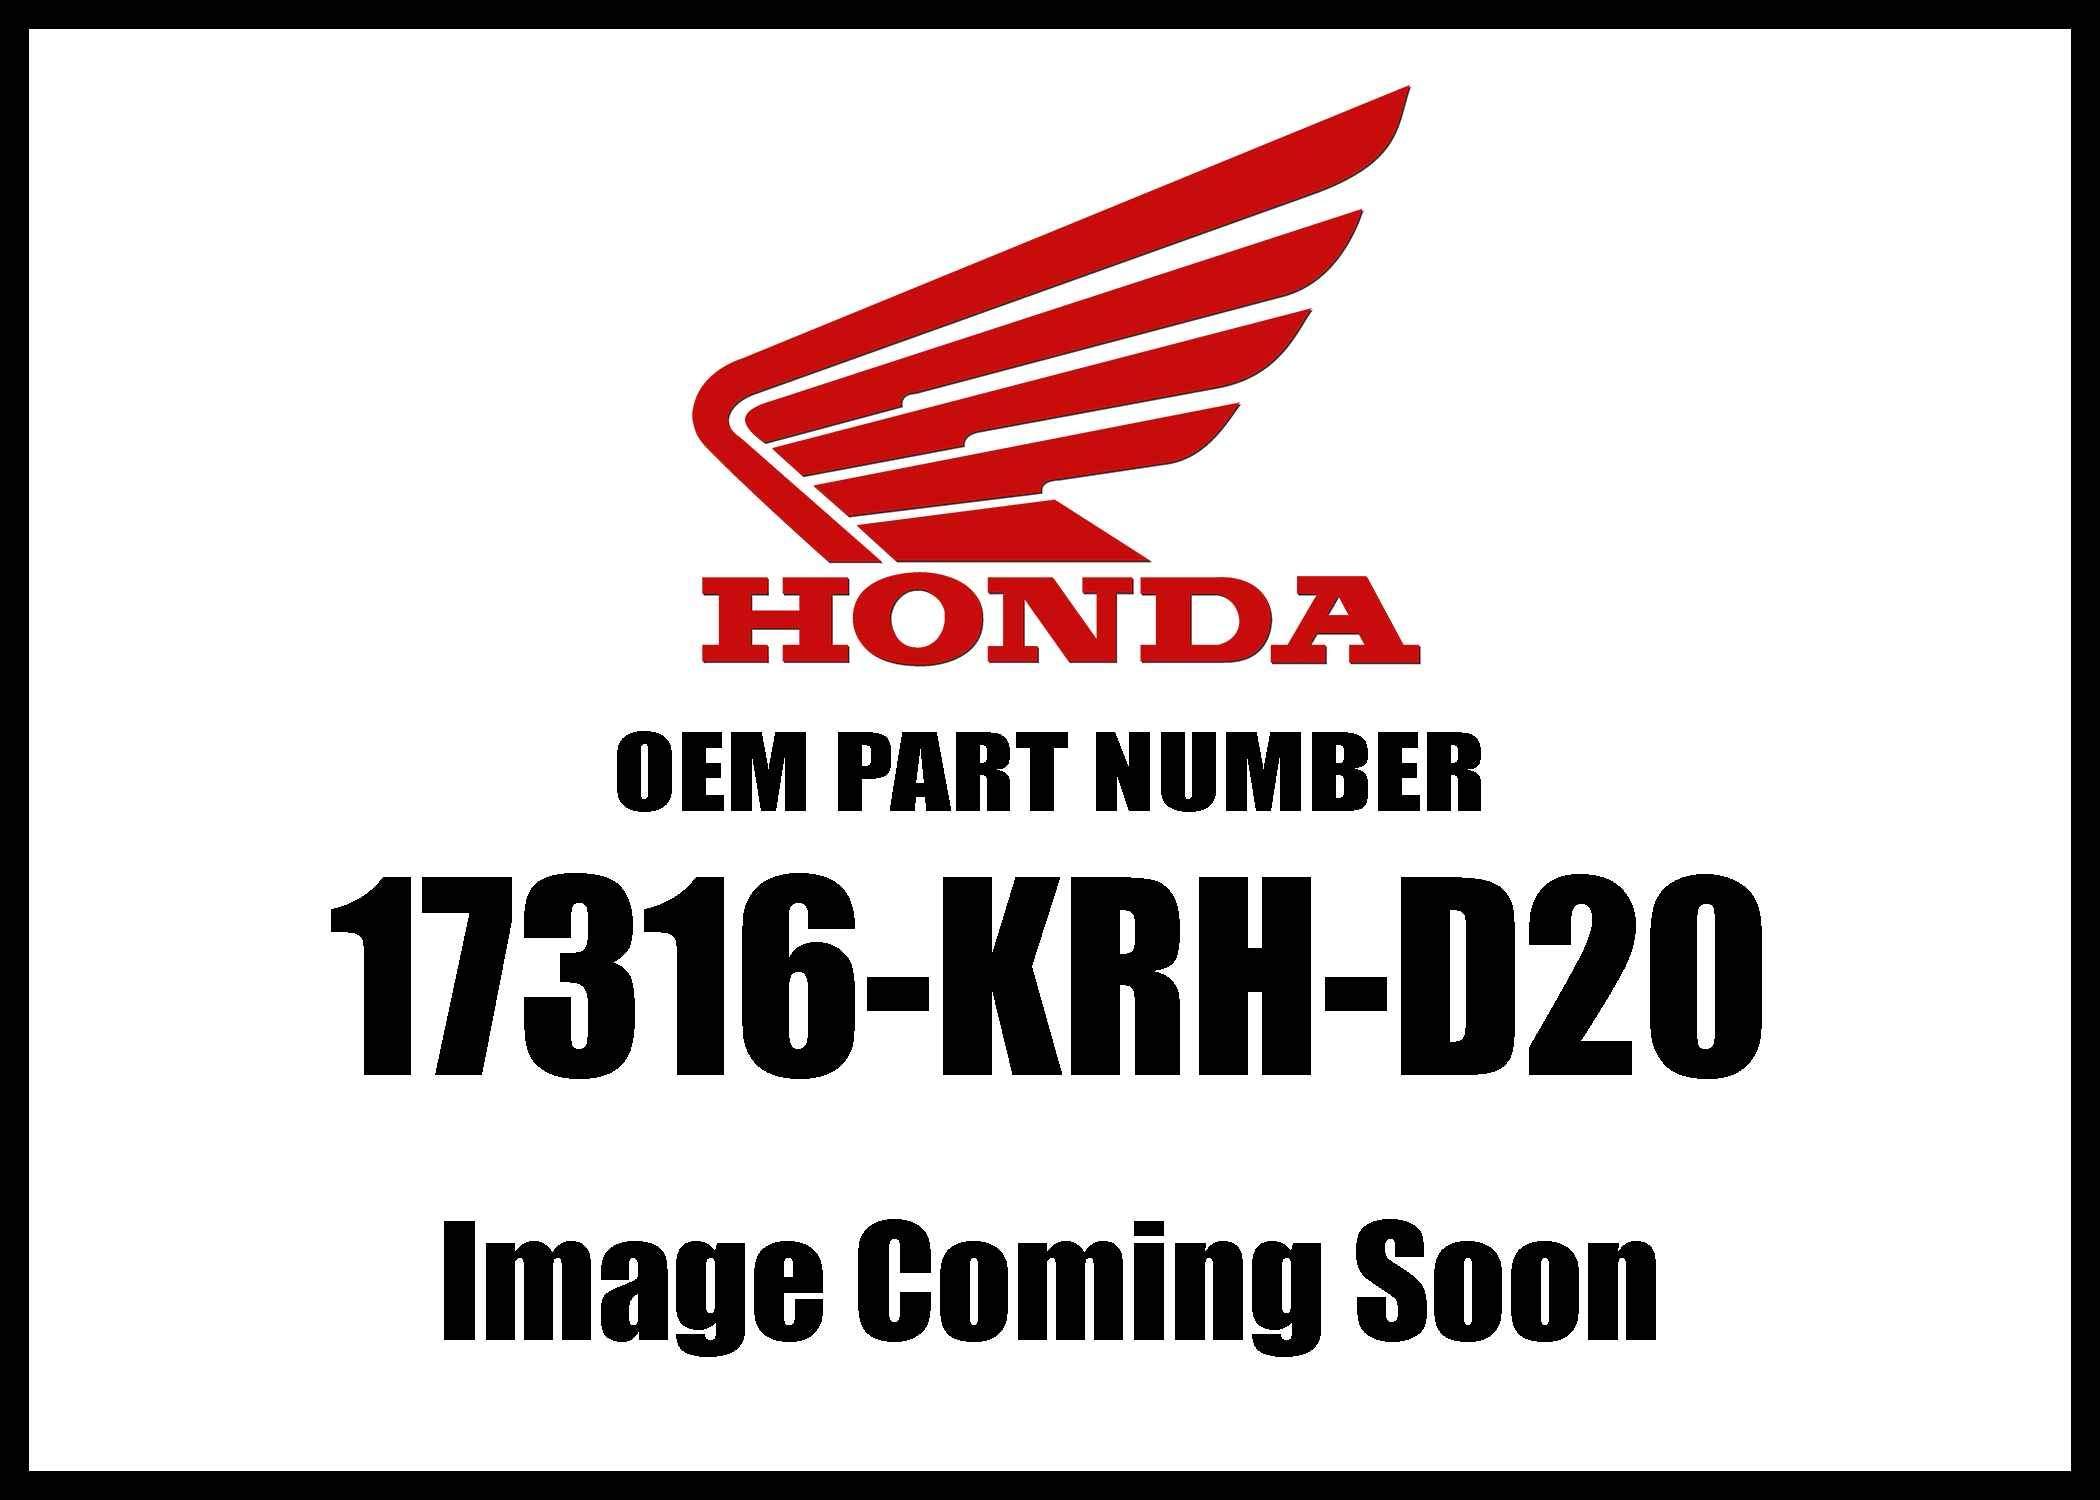 Honda Crf250f '19 Clip Breather Tube 17316-Krh-D20 New Oem